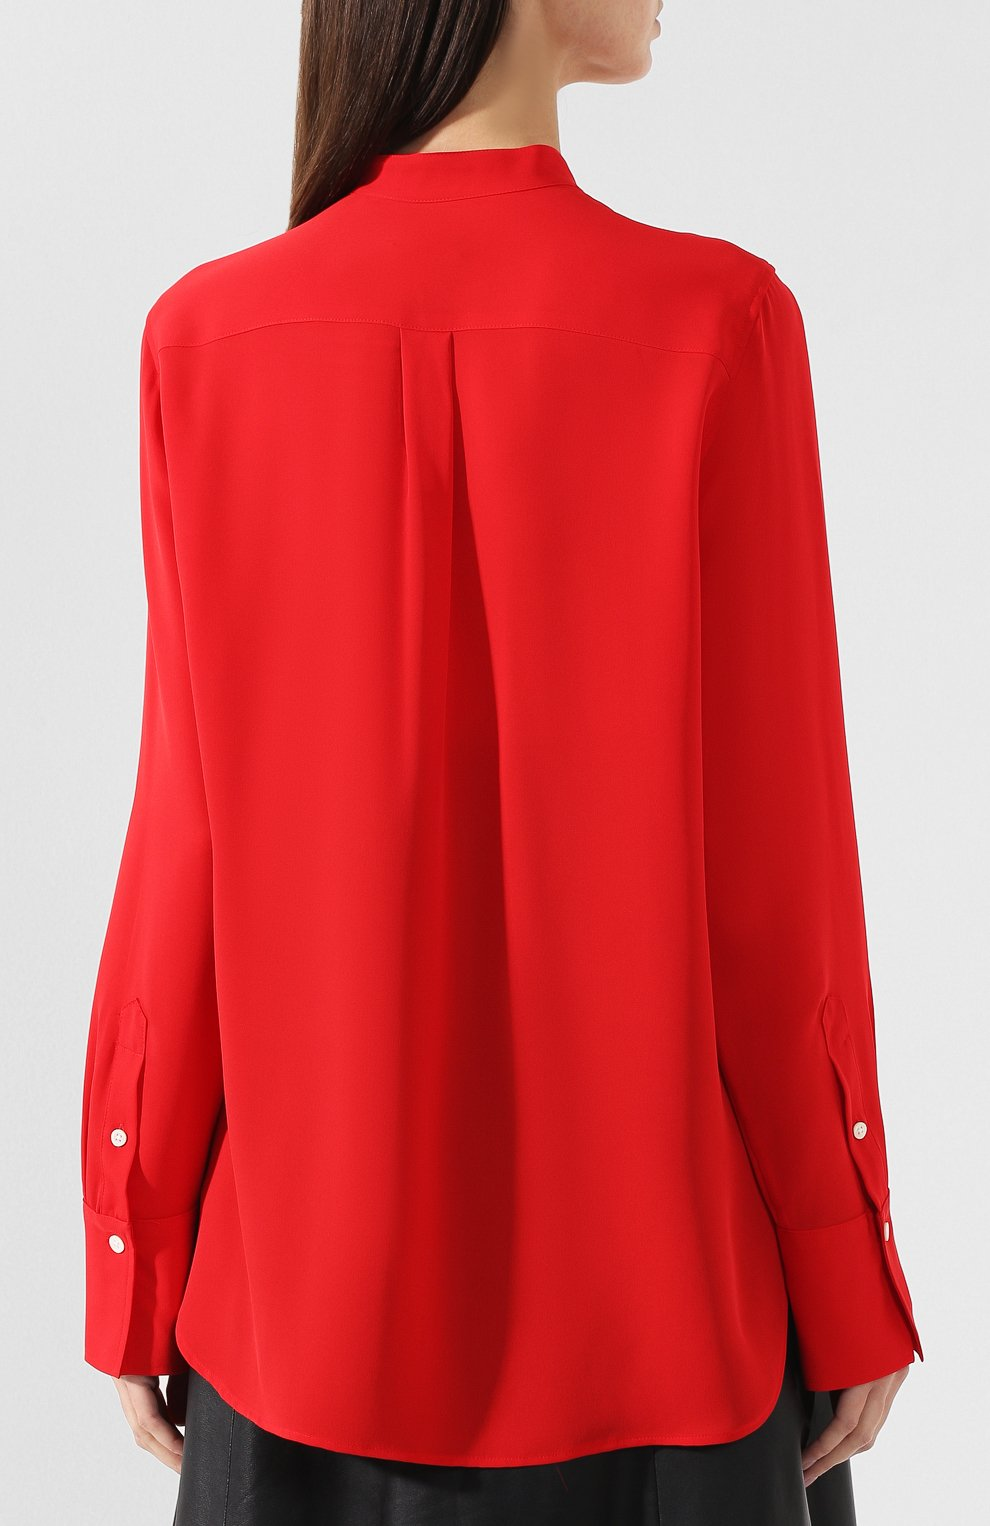 d873907ecde Женская красная шелковая блузка POLO RALPH LAUREN — купить за 19450 ...